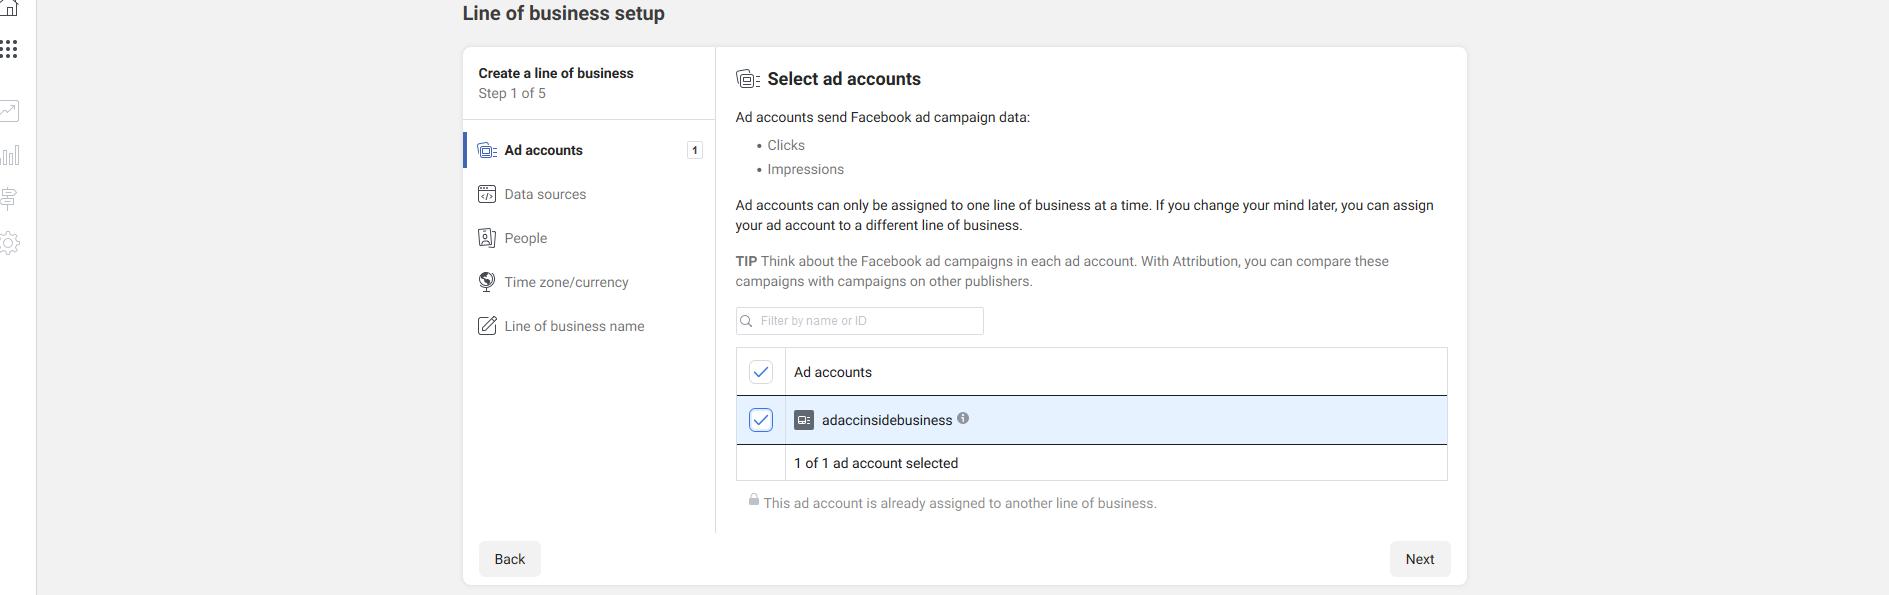 select ad accounts